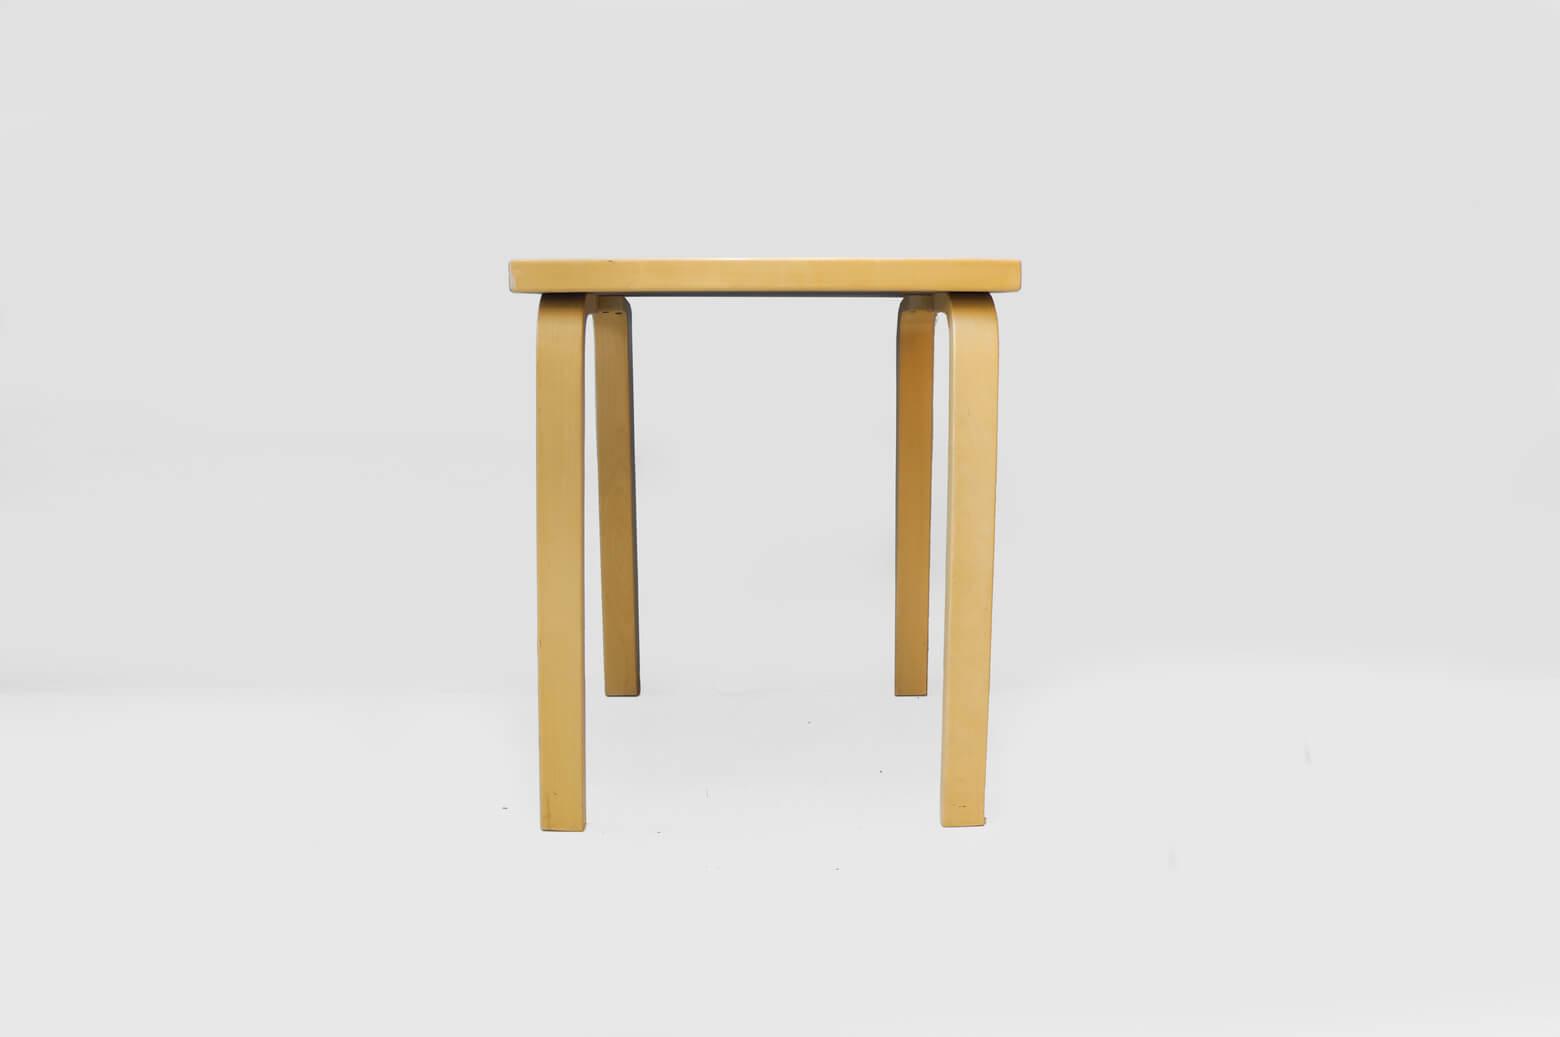 Vintage artek table 80C Alvar Aalto design/ヴィンテージ アルテック テーブル80C アルヴァ・アアルト デザイン 1